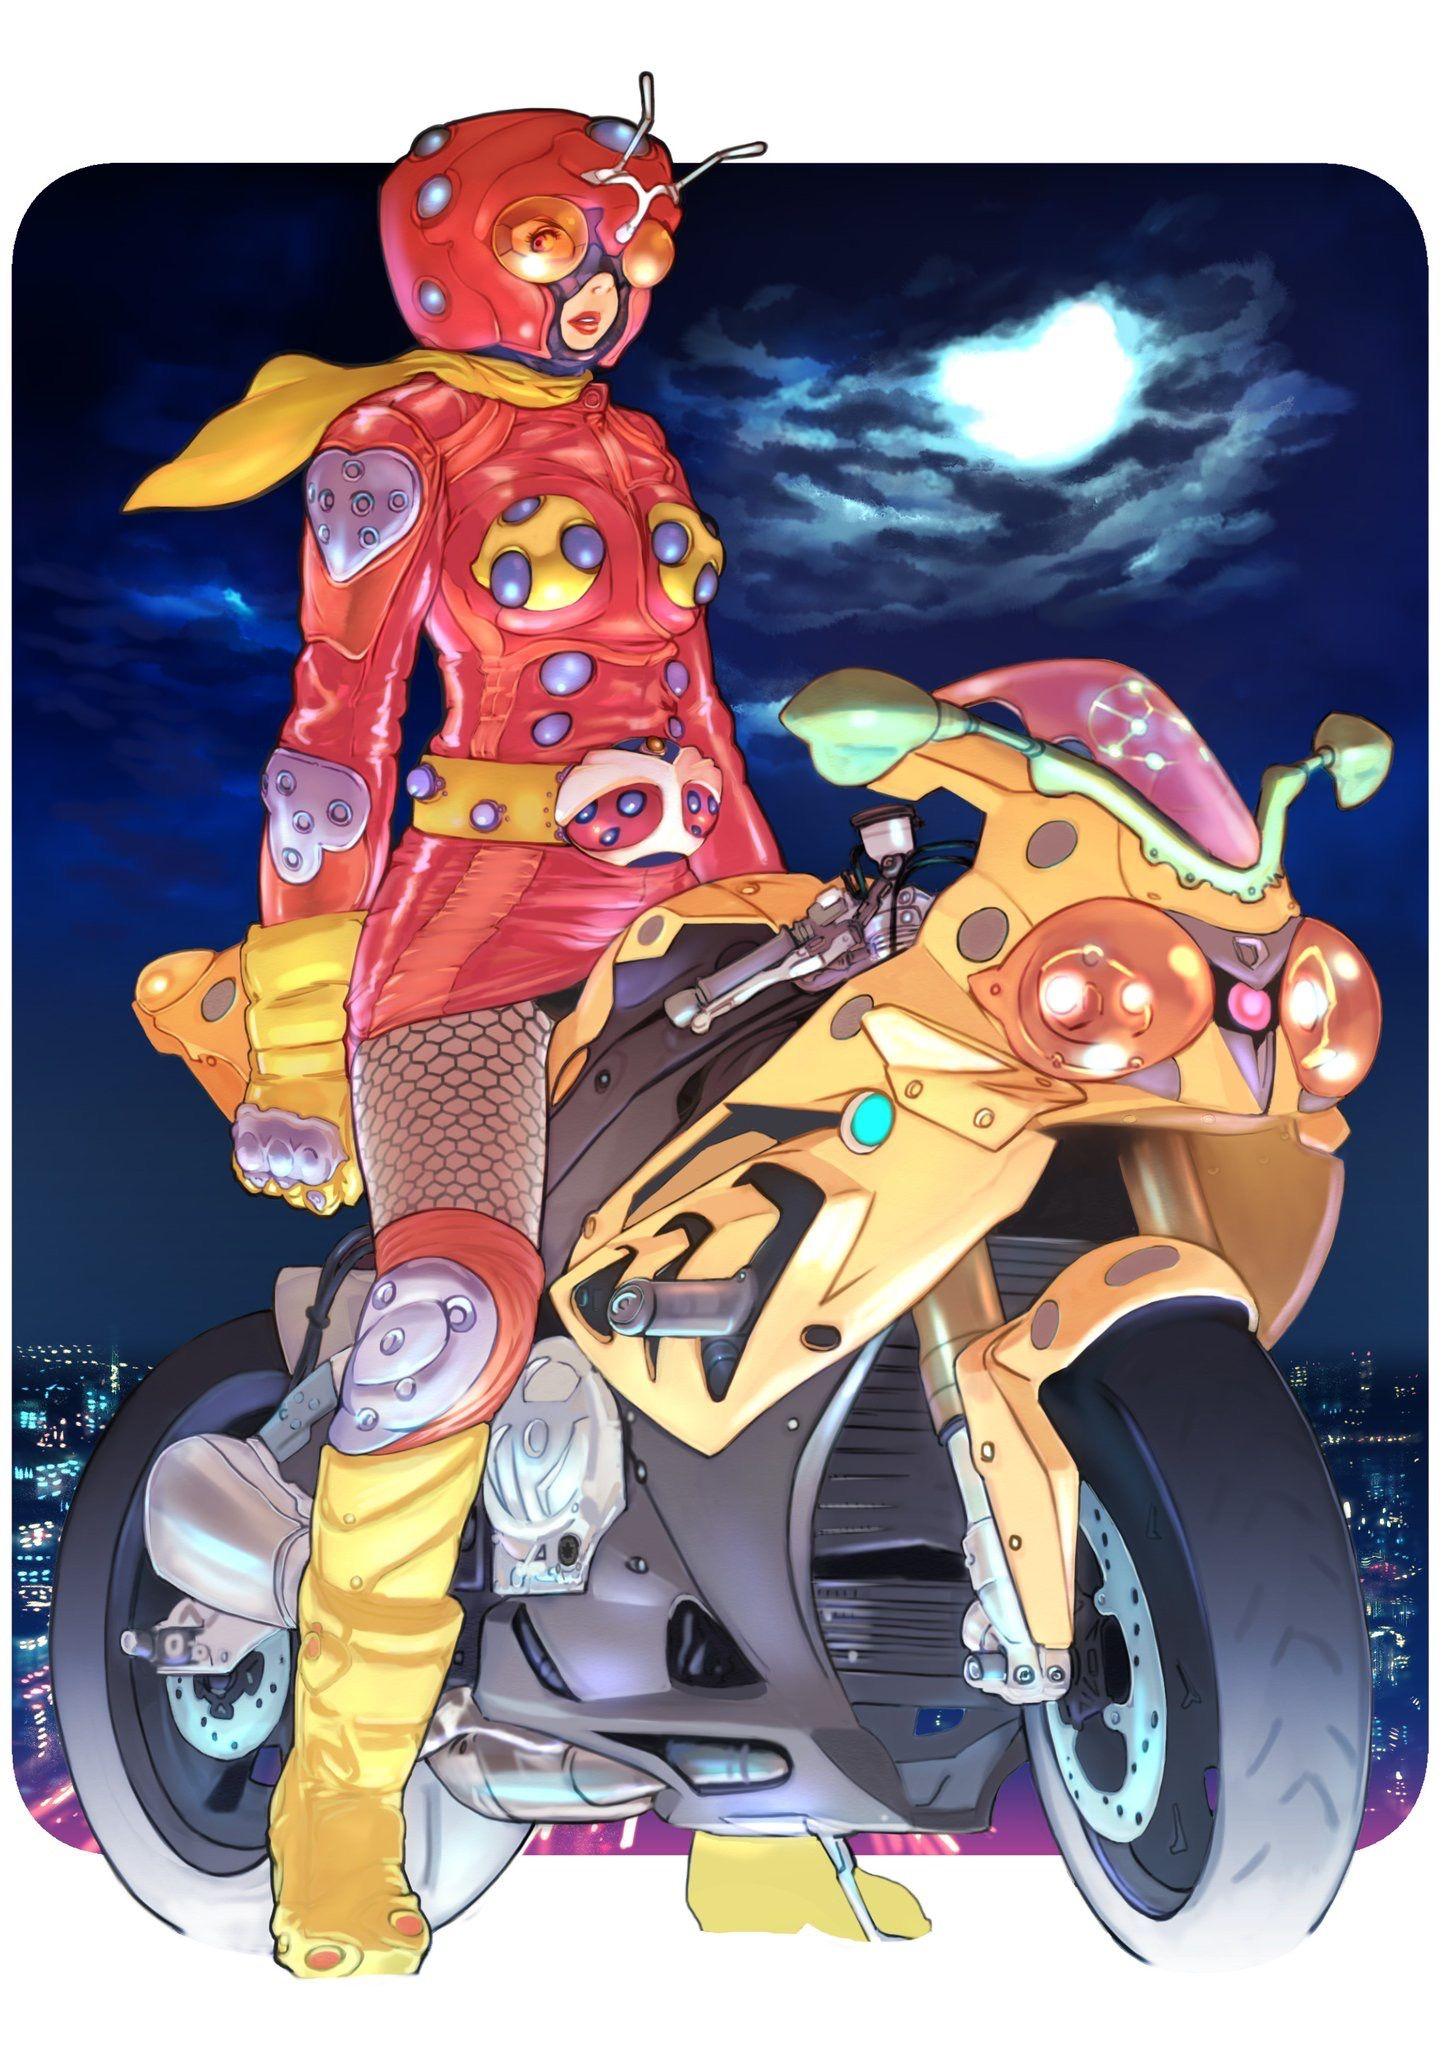 Pin by Thairandy on コミックガールズ Anime, Kamen rider, Art